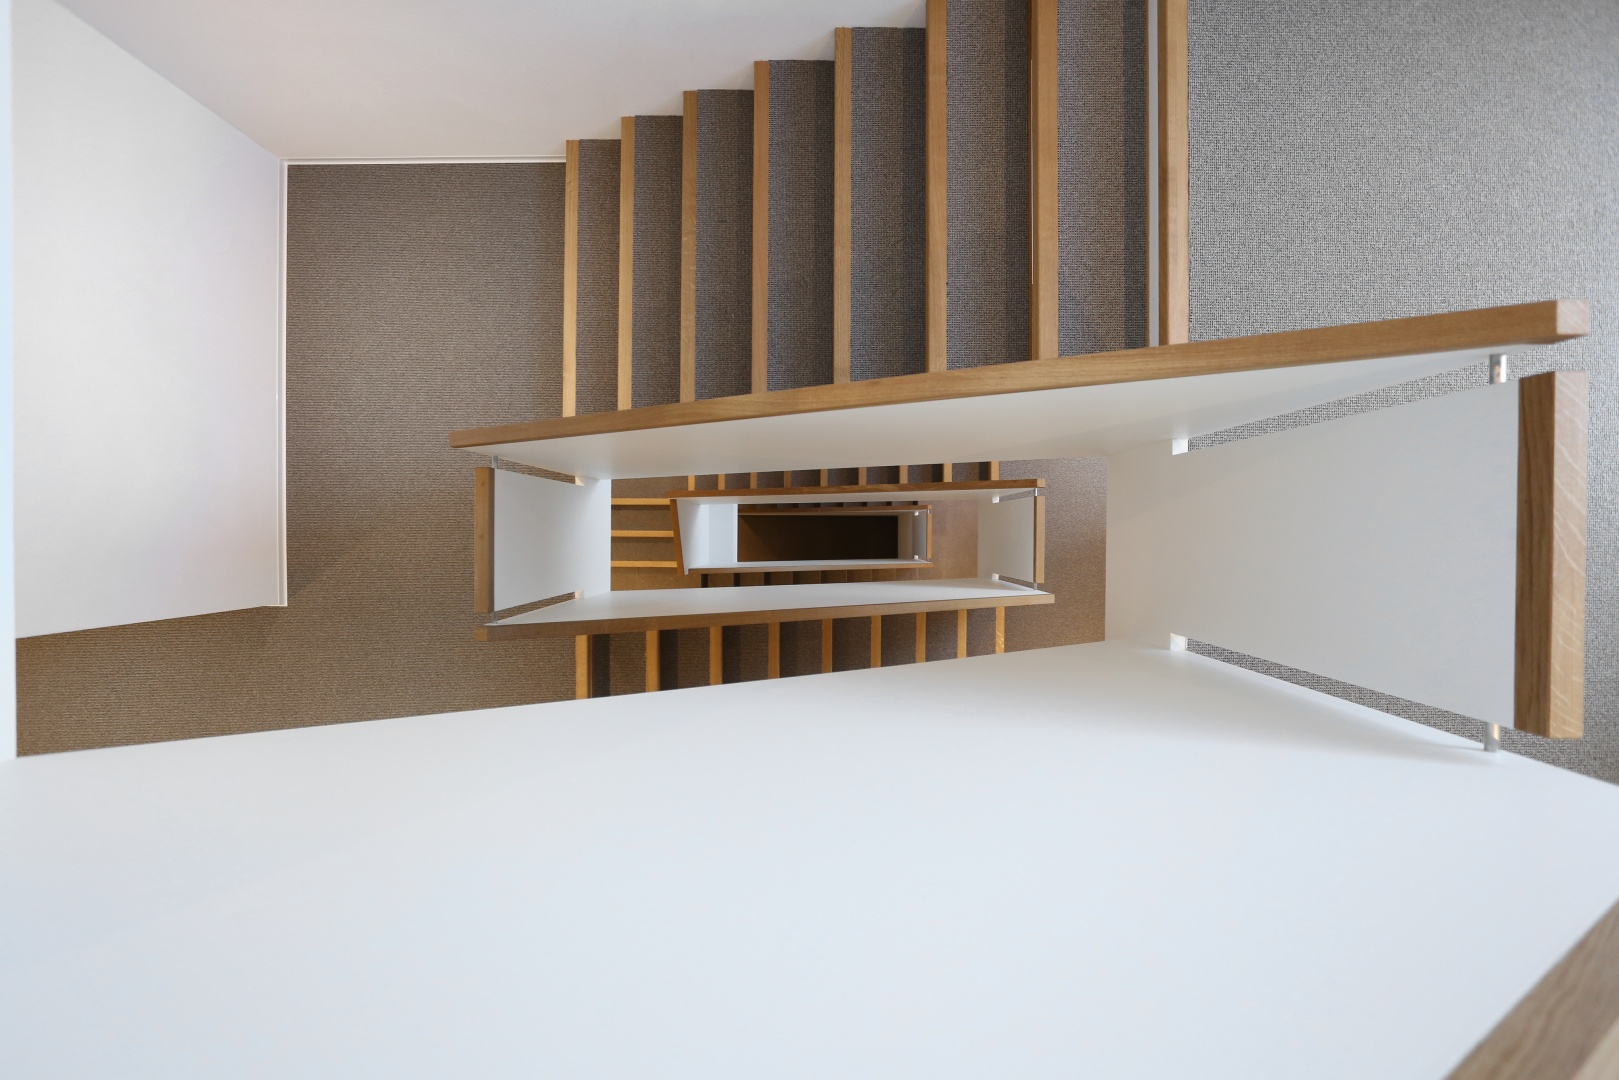 Treppenhaus © Yvonne Bollhalder